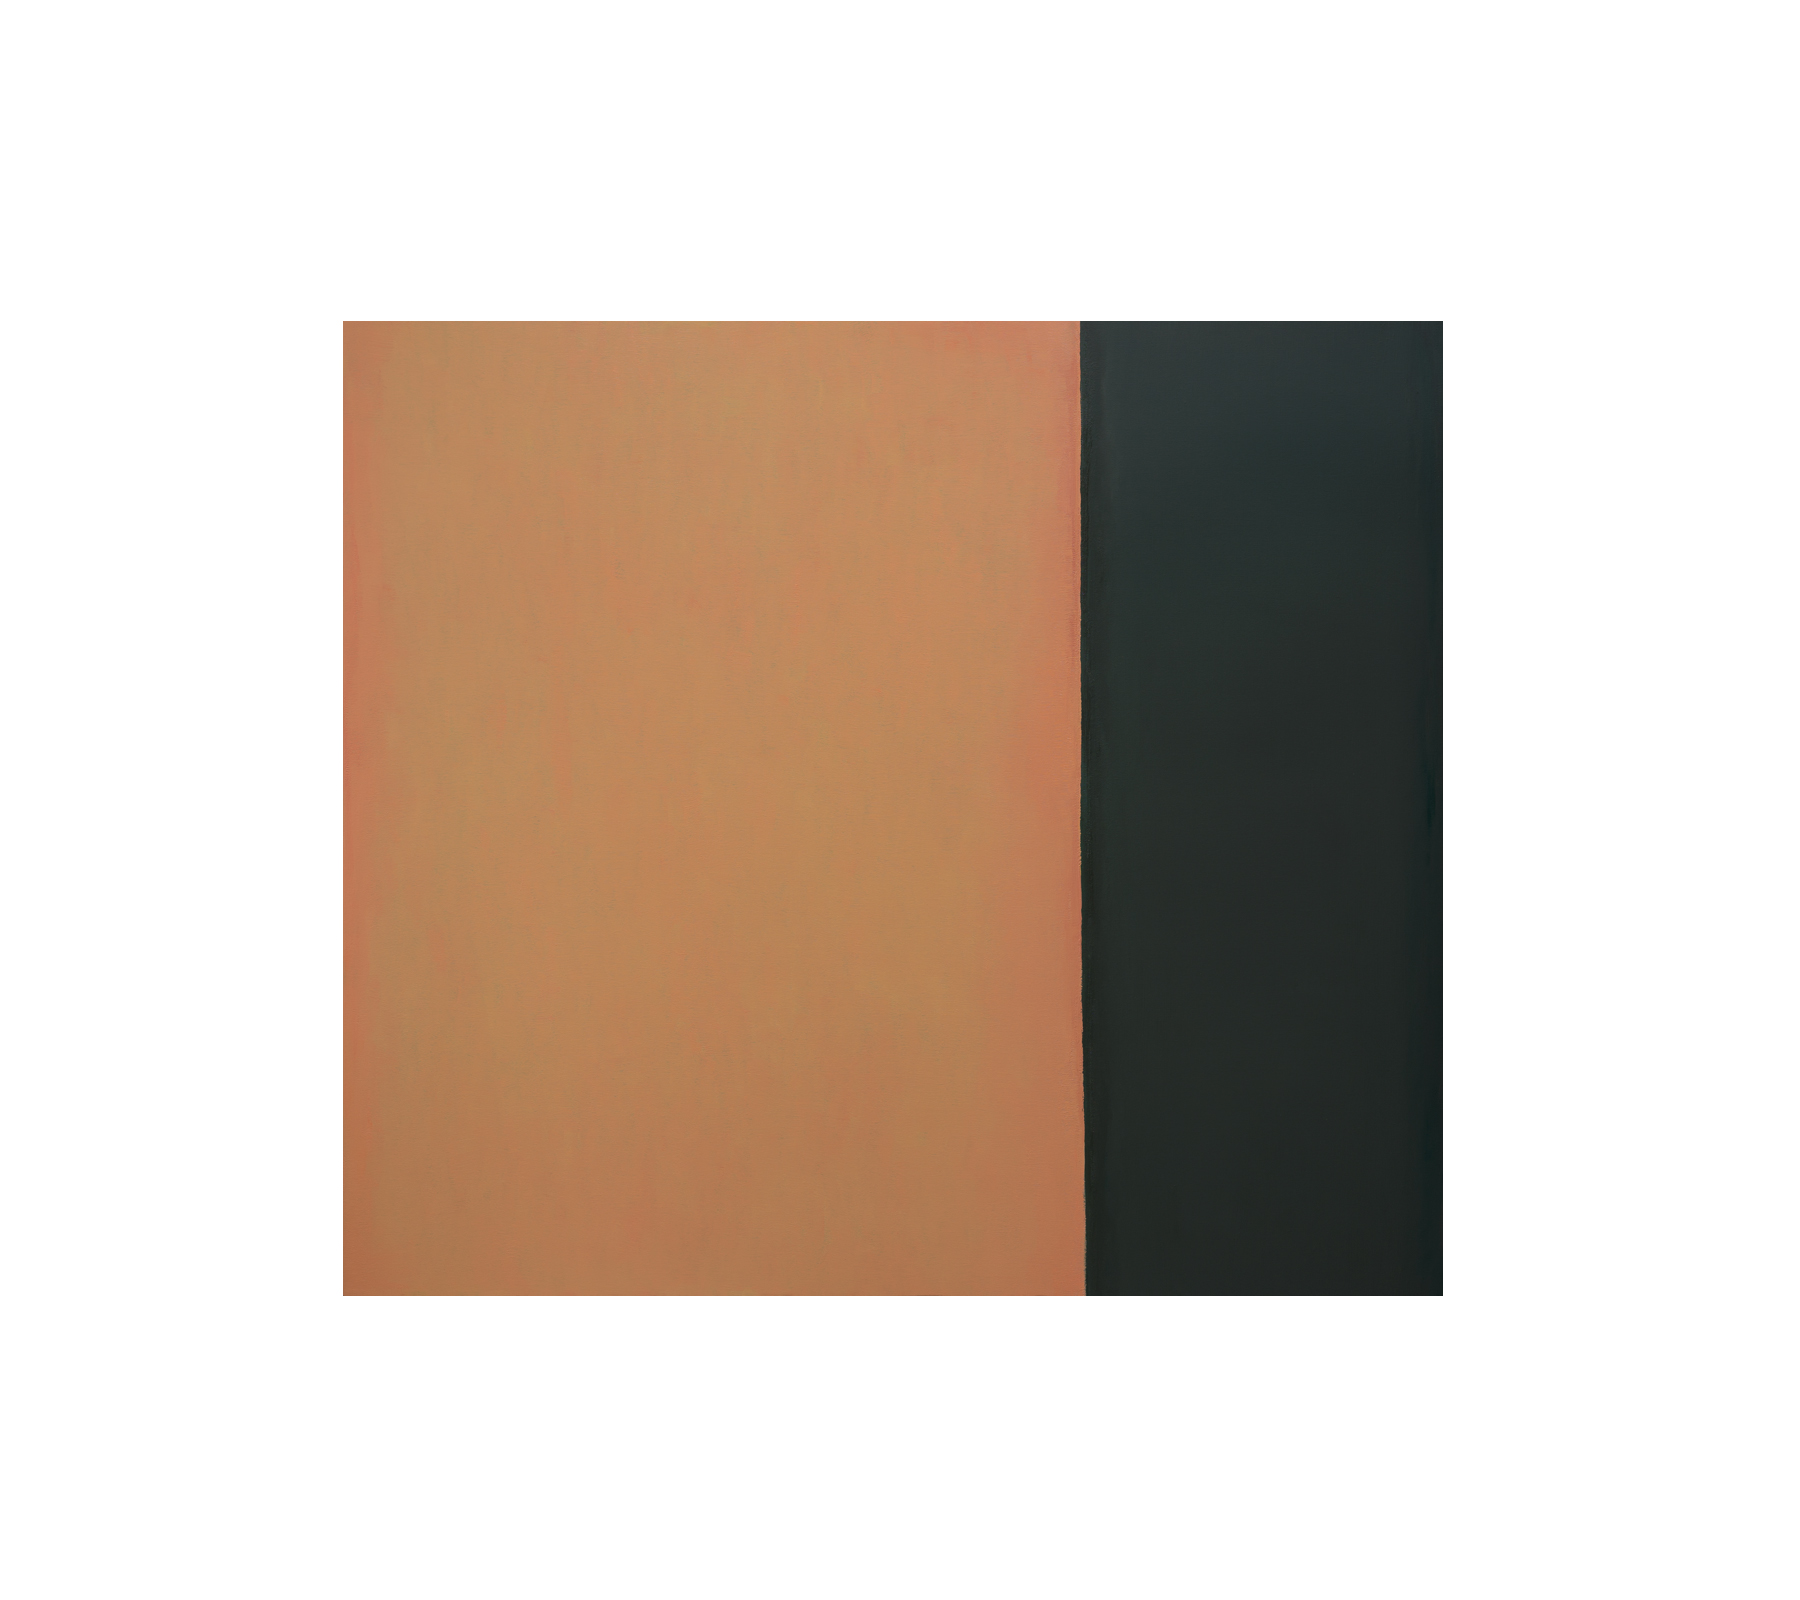 Untitled (Fall) 2019 160x180cm